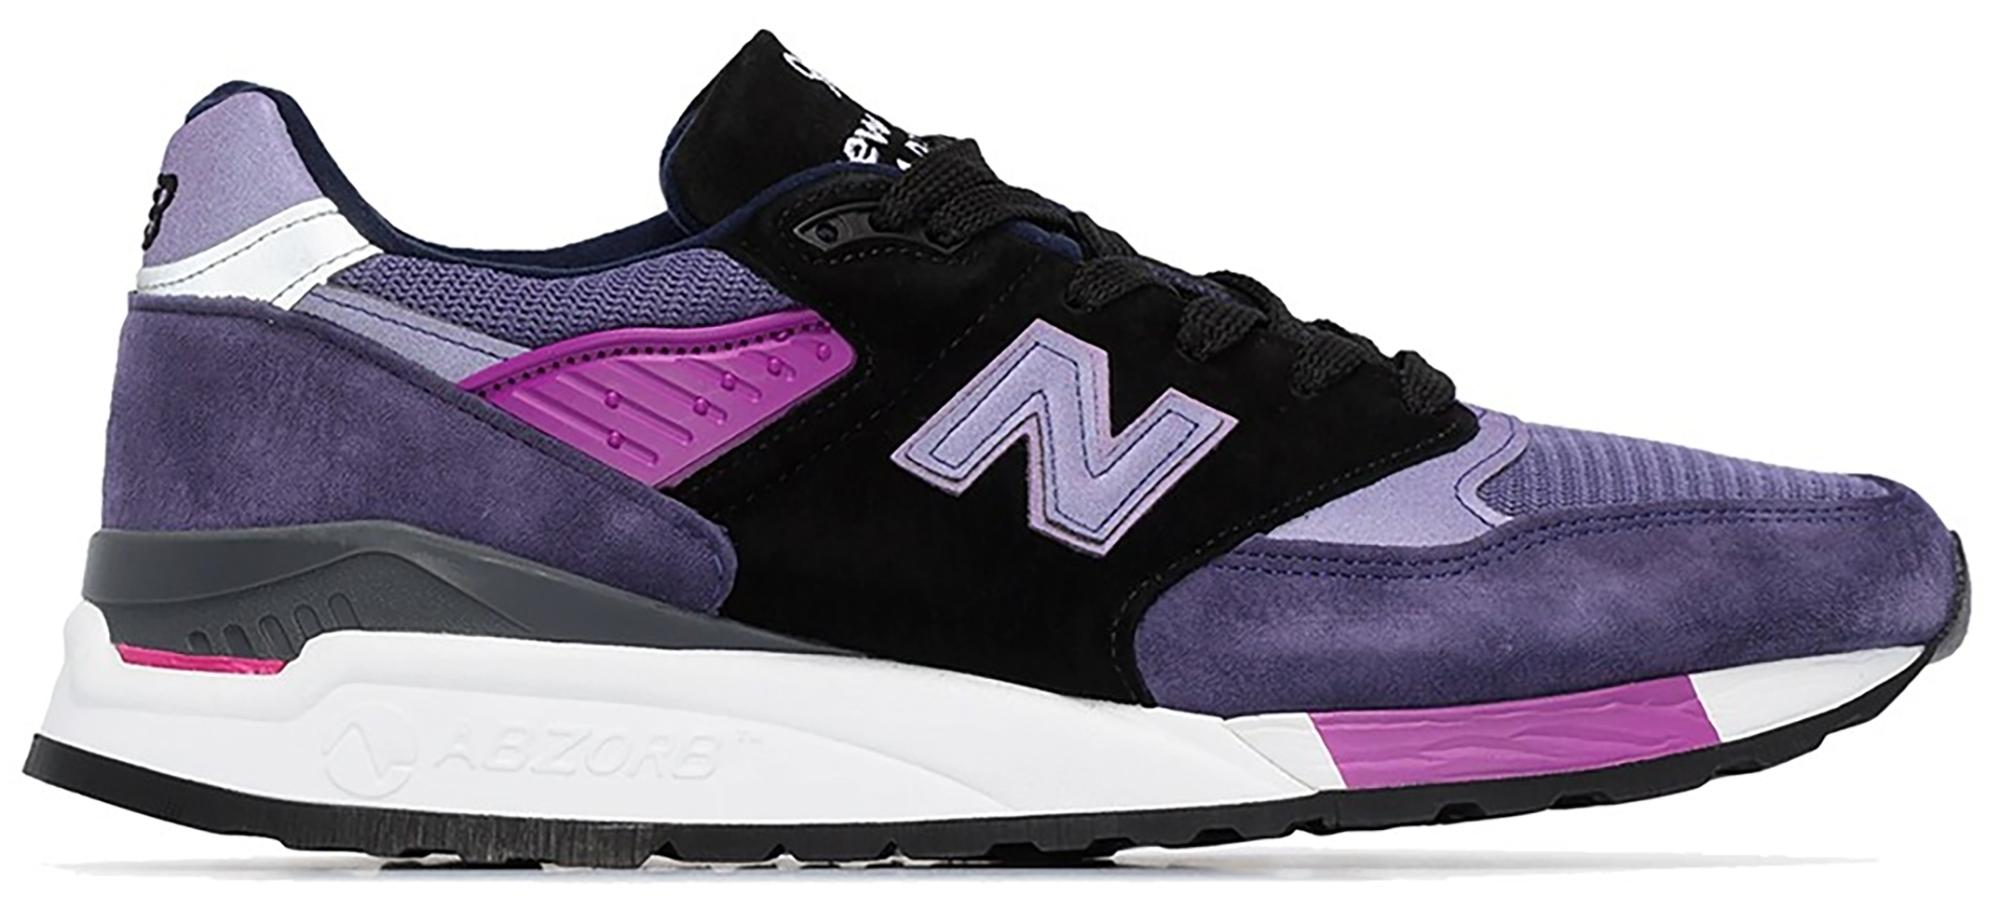 New Balance 998 Purple Black - M998BLD